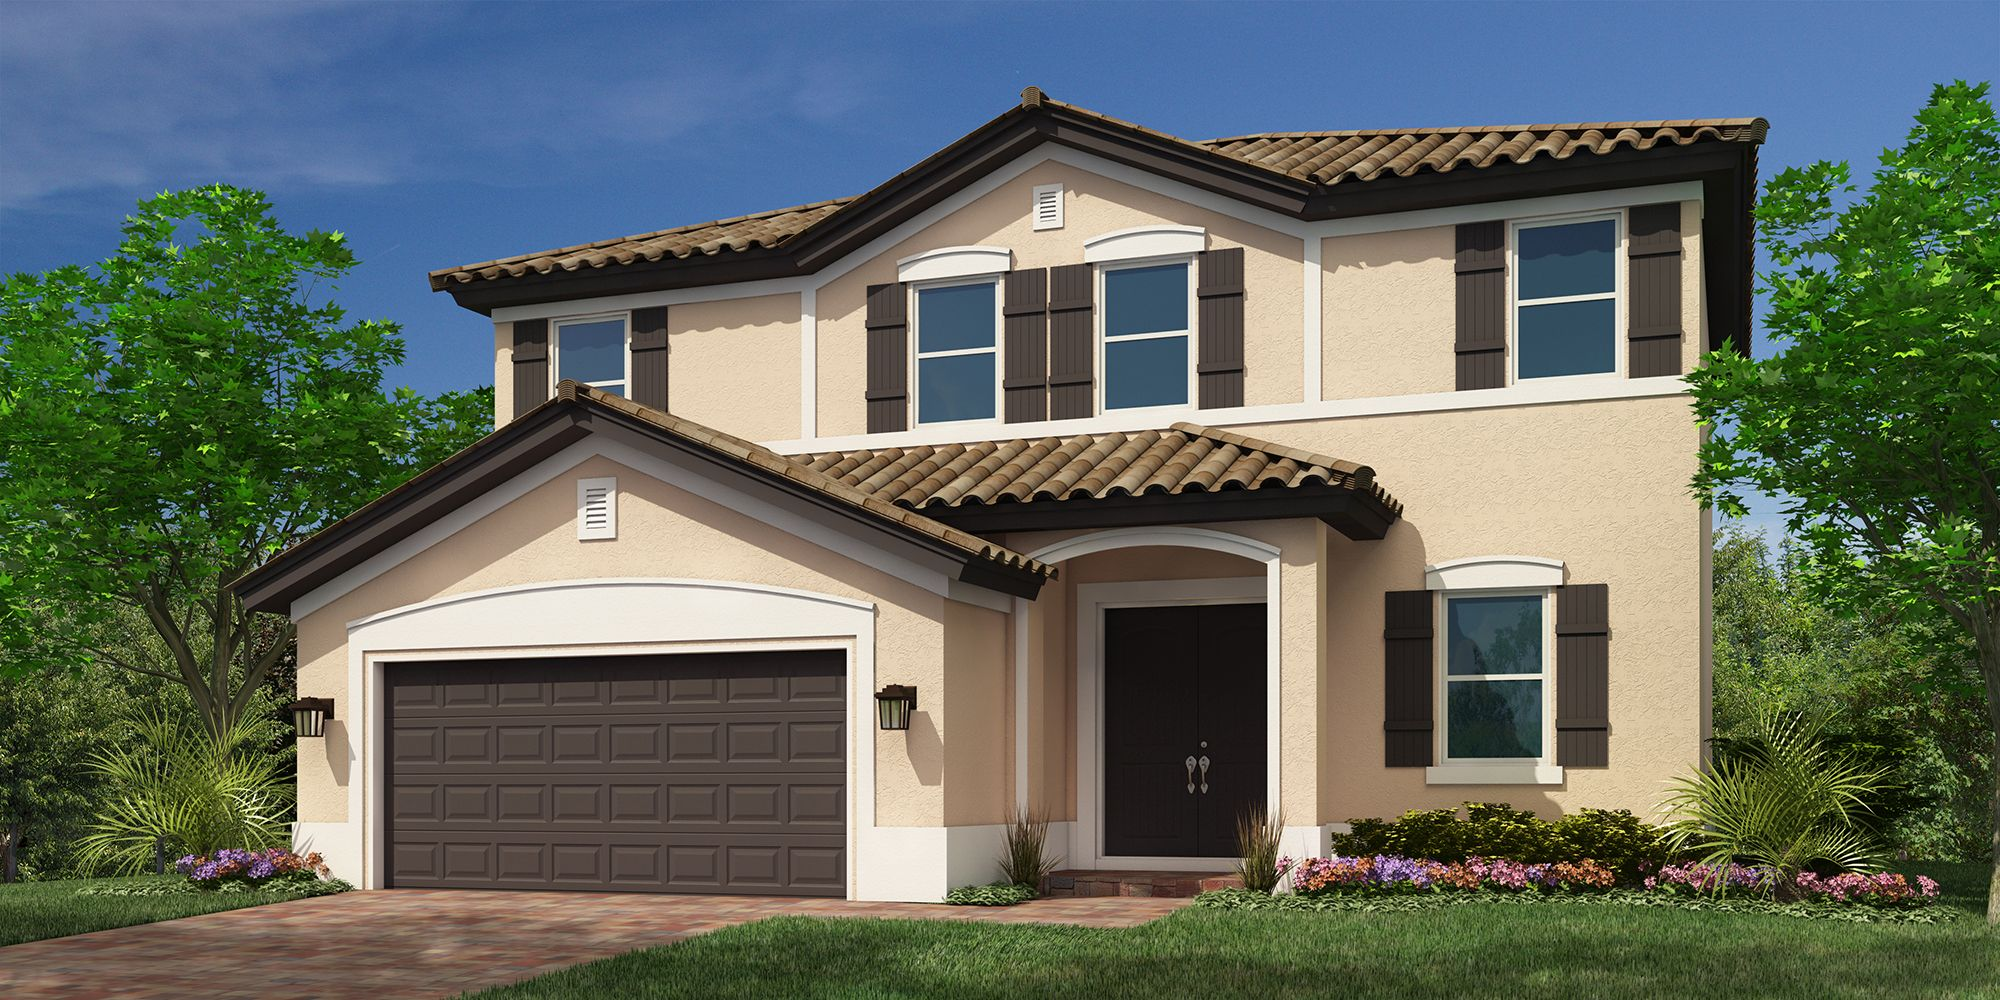 133 se 21 terrace crestview homestead florida 33033 for 4165 woodlyn terrace york pa